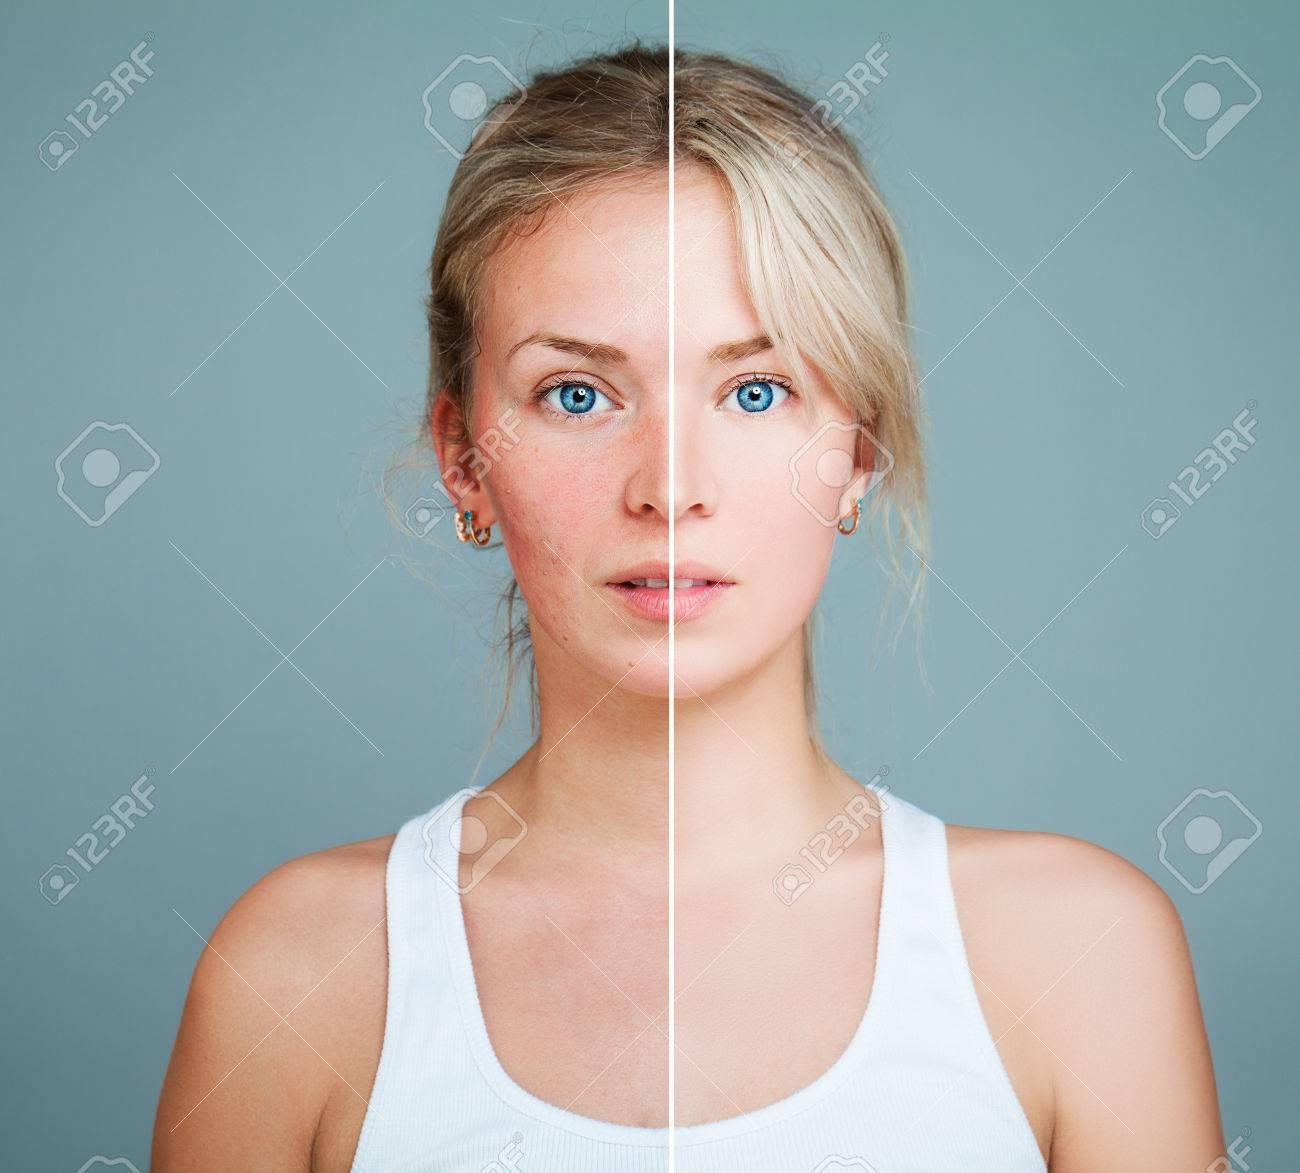 http://n3.datasn.io/data/api/v1/n3zm/image_of_skin_disease_5/by_table/skin_disease_image_download_access/b7/c3/f7/1e/b7c3f71e43571ba34aad9369e90a6da41353a651.jpg